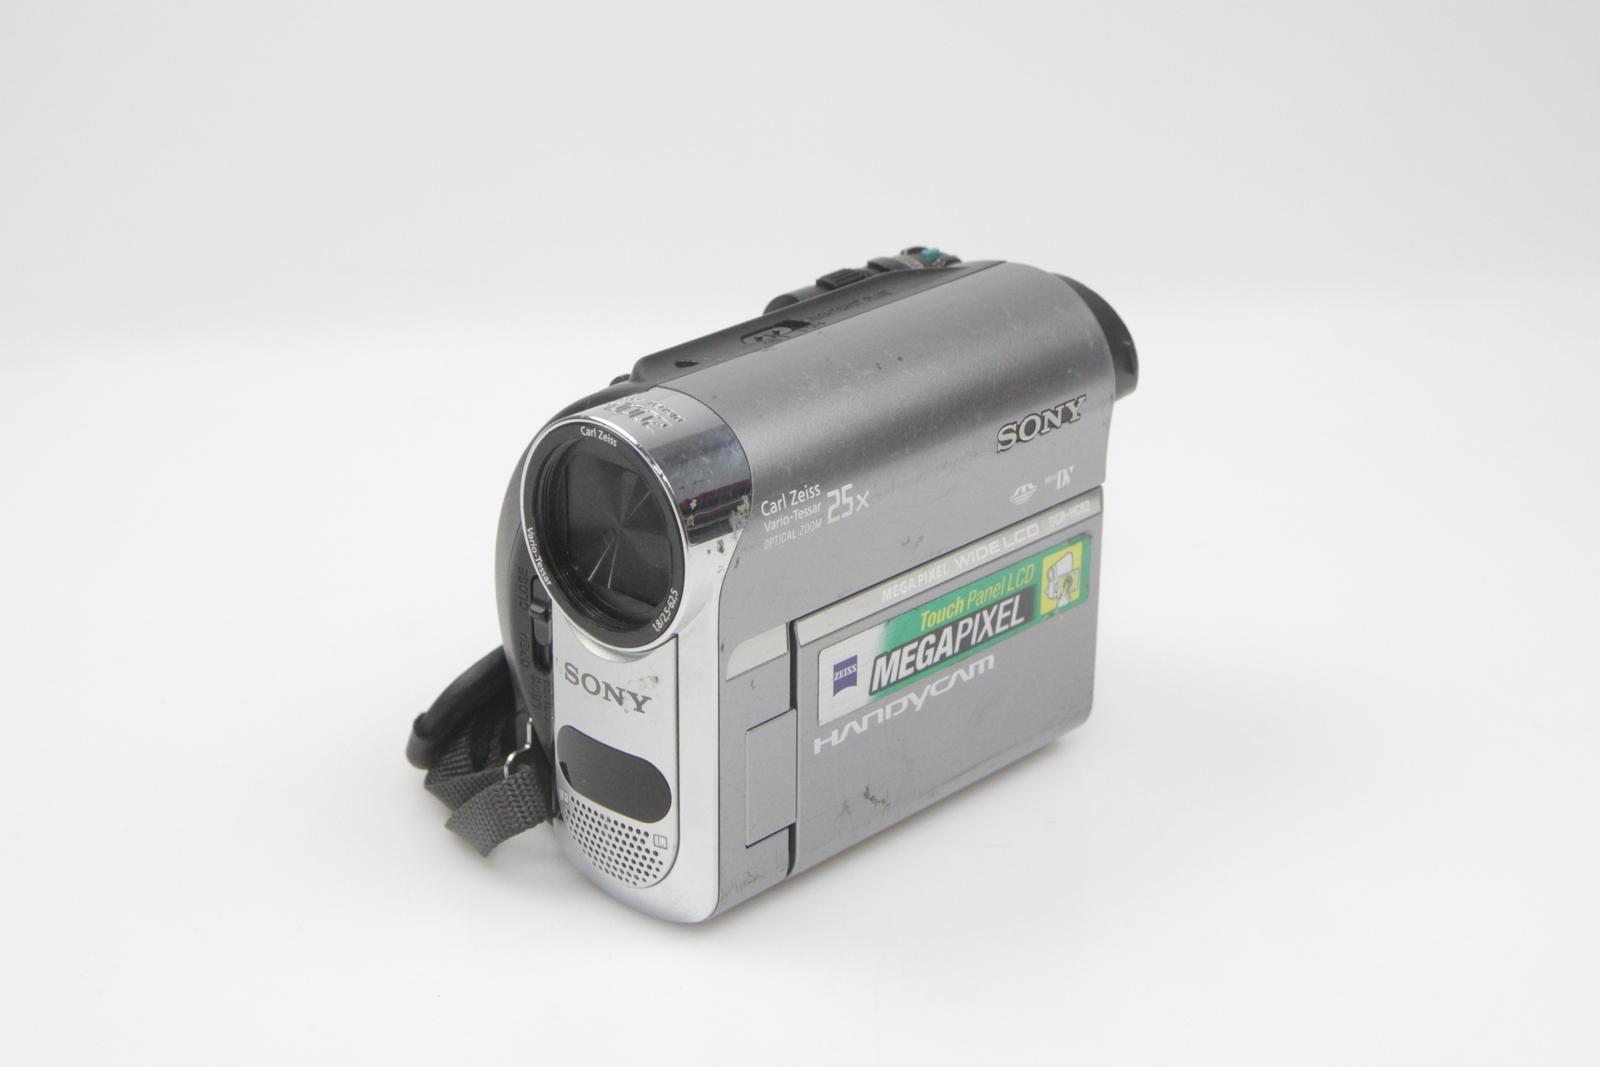 SONY HANDYCAM DCR-HC62 DRIVERS FOR WINDOWS